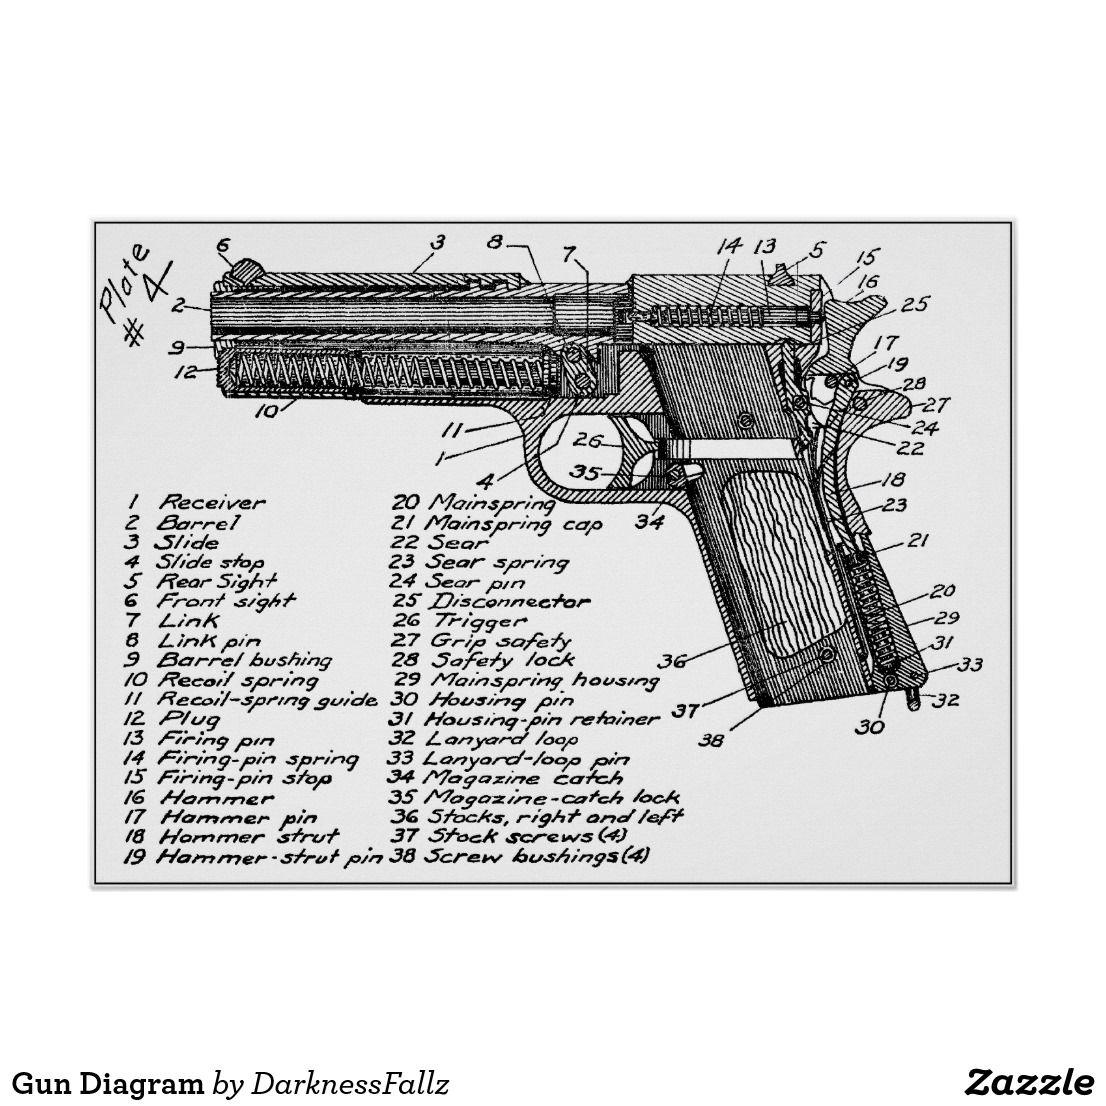 gun diagram poster zazzle com gun diagram poster